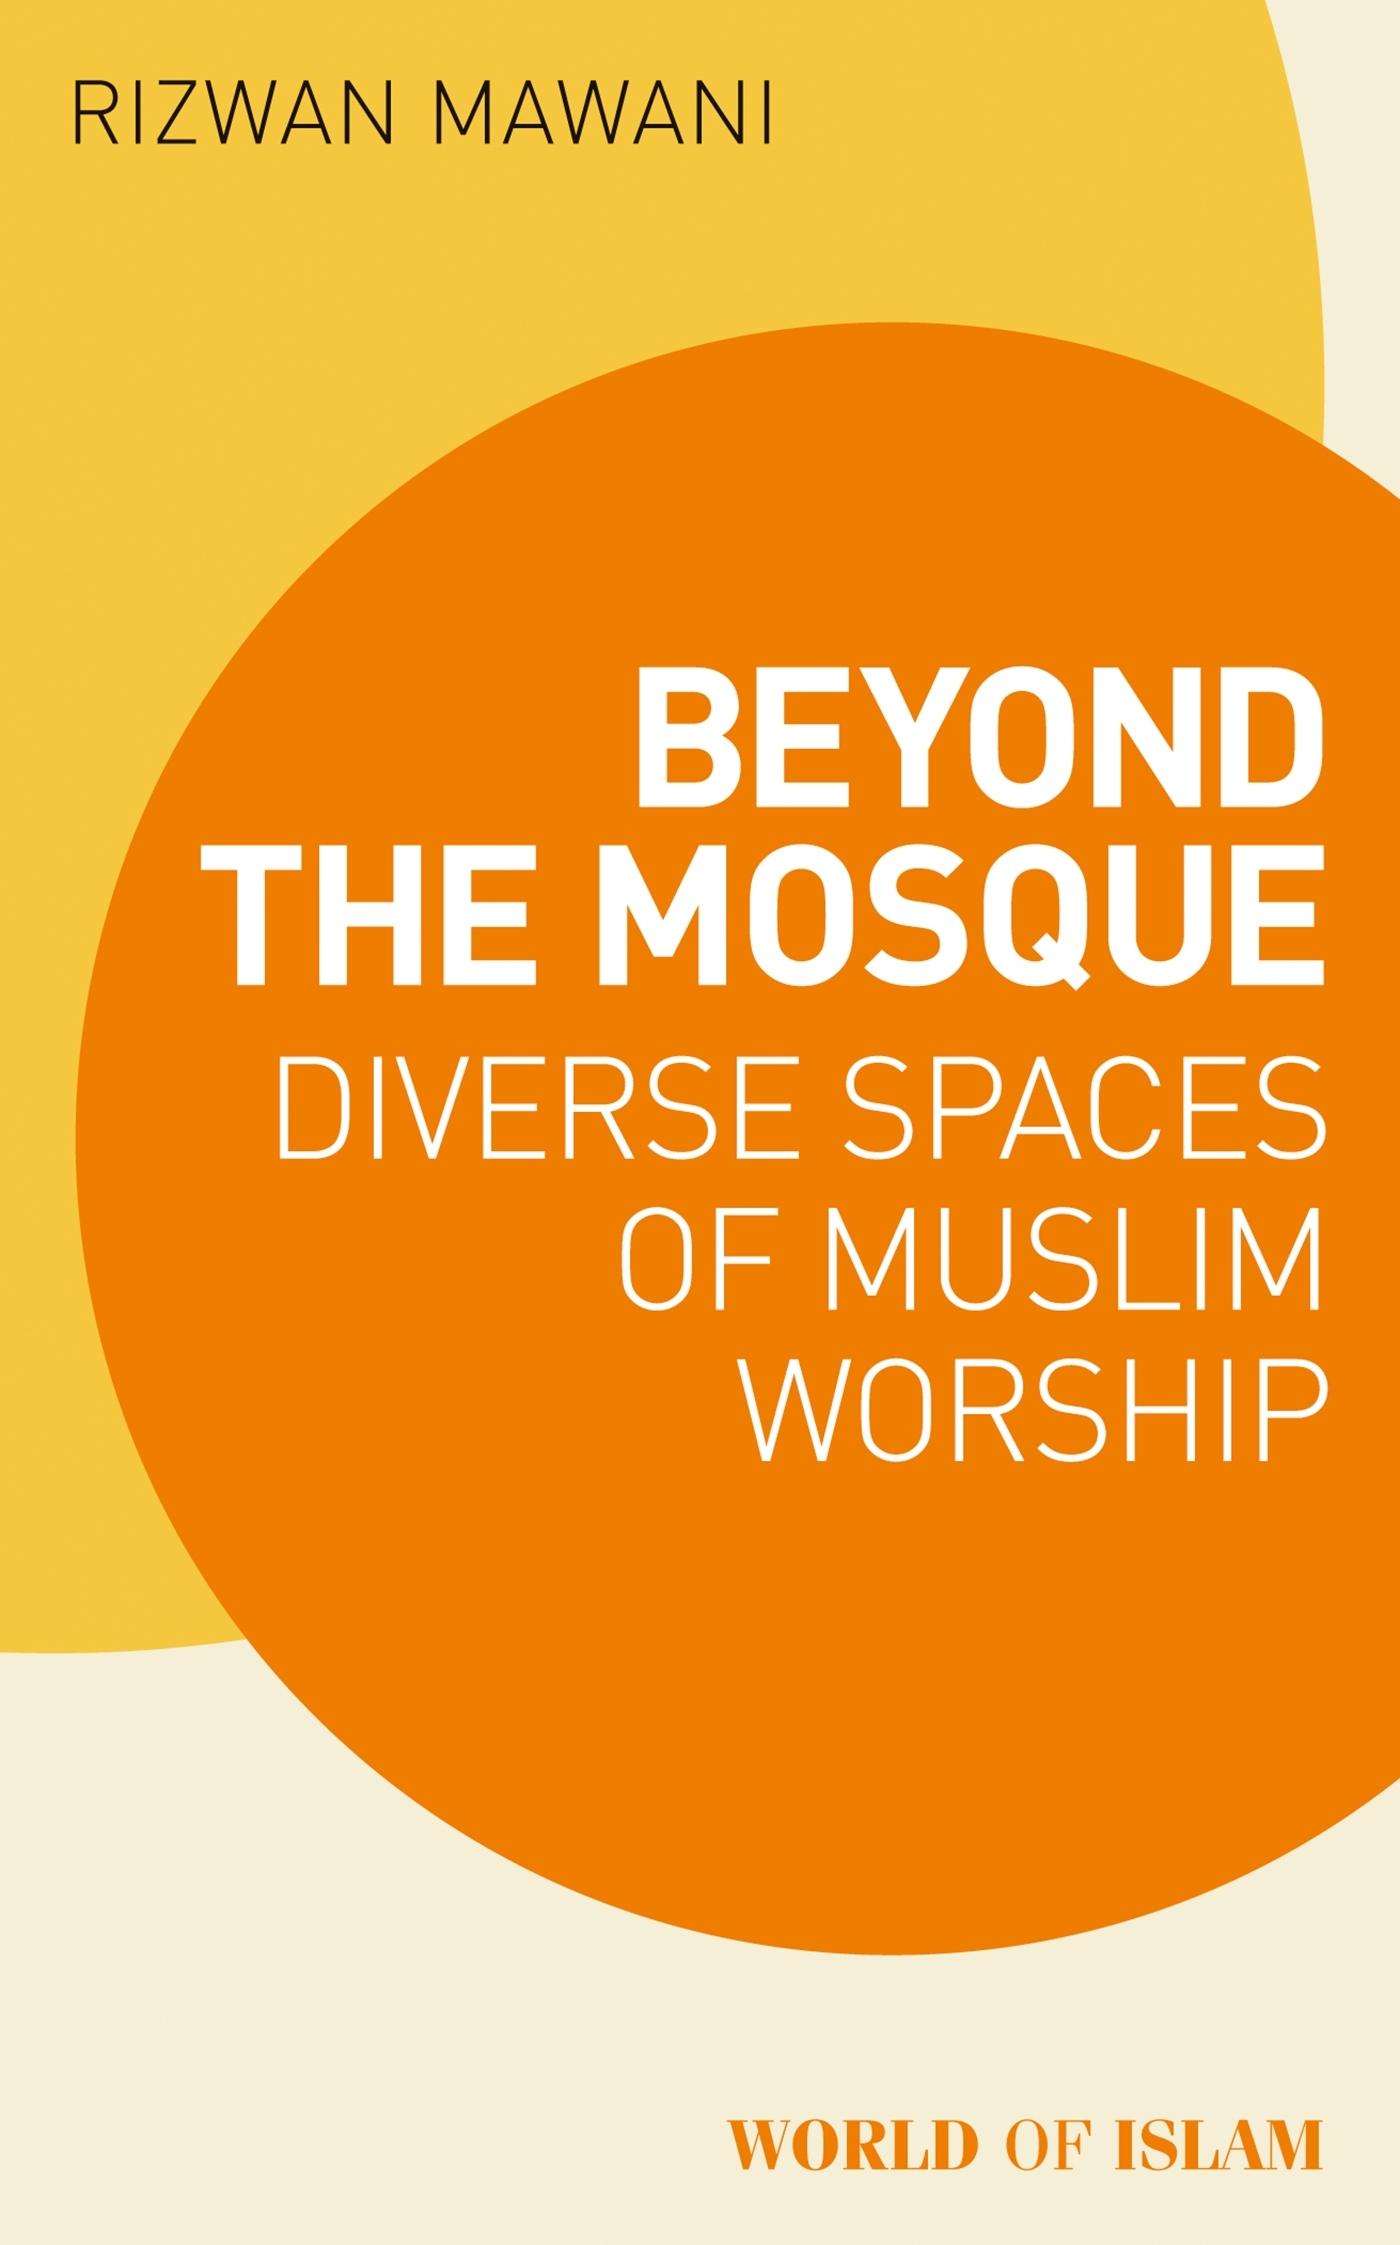 Beyond the Mosque: Diverse Spaces of Muslim Worship by Rizwan Mawani